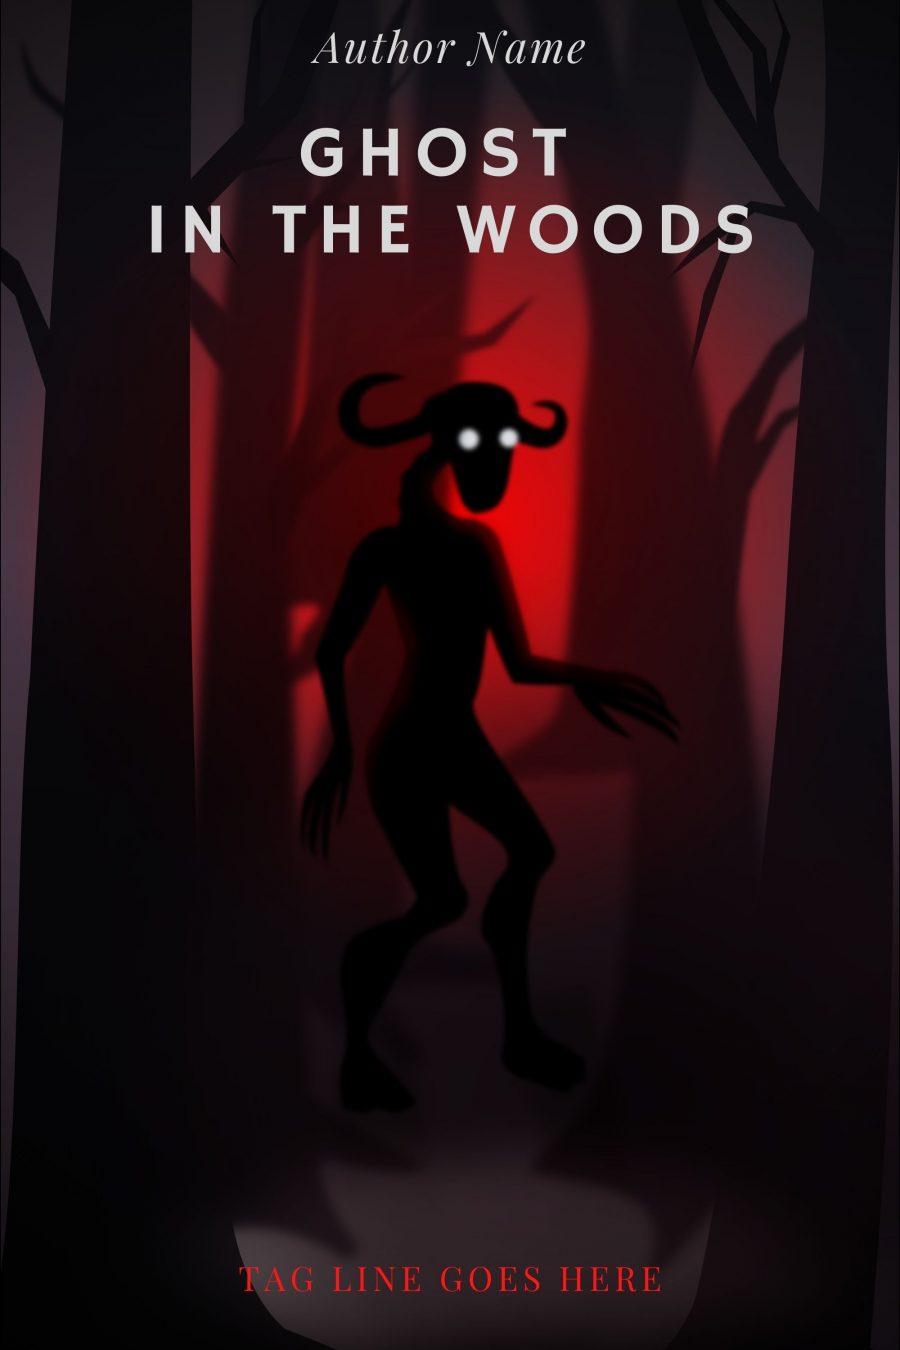 Monster among trees